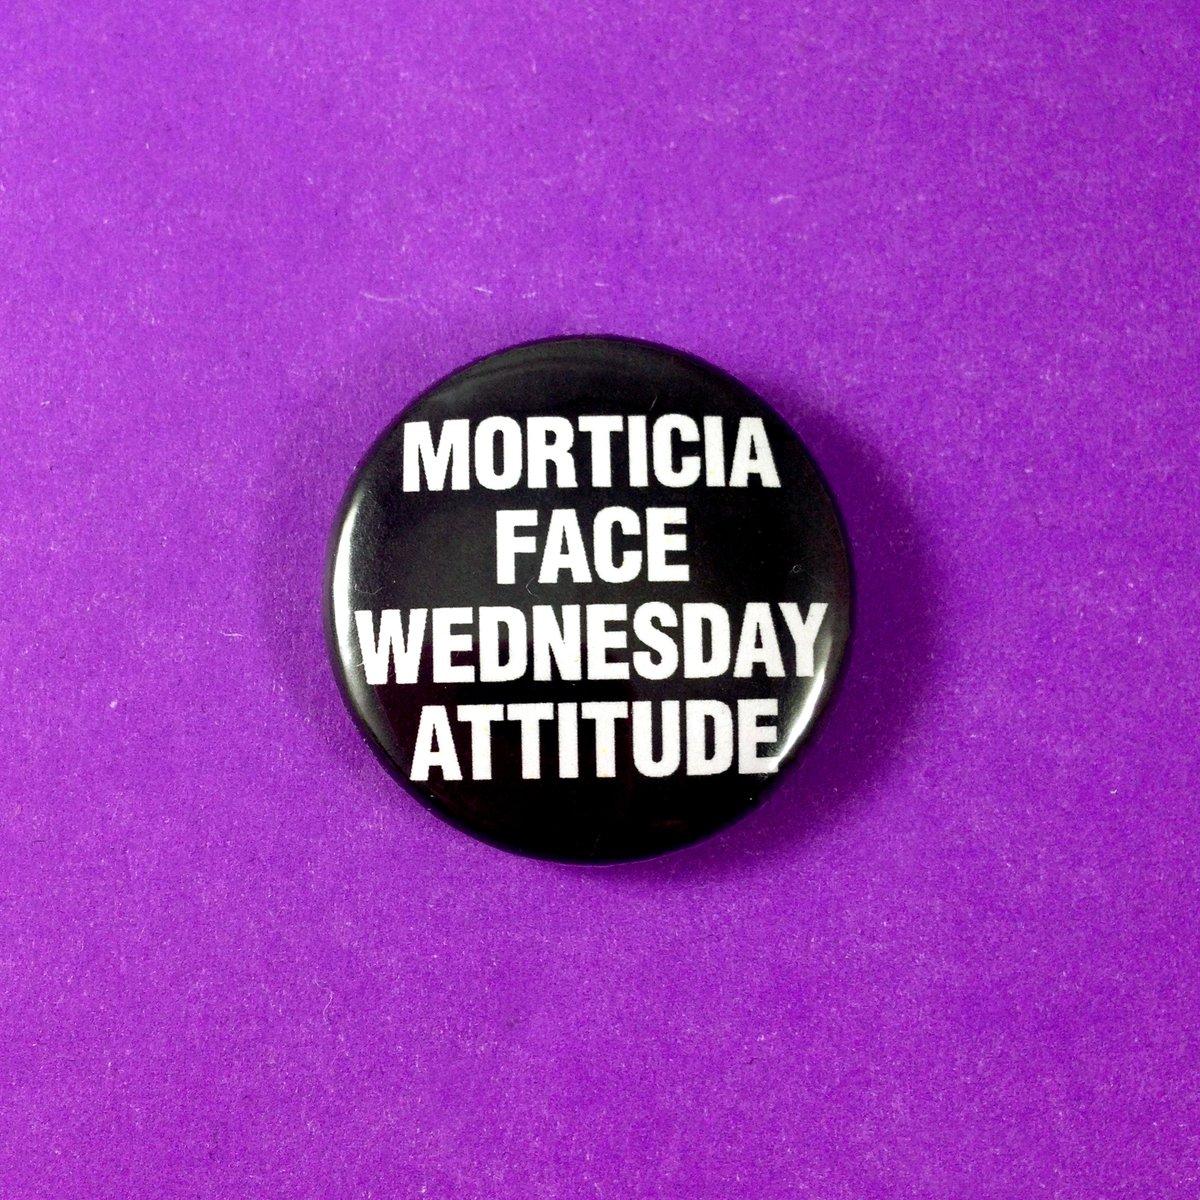 Image of Morticia Face Wednesday Attitude Pinback Button